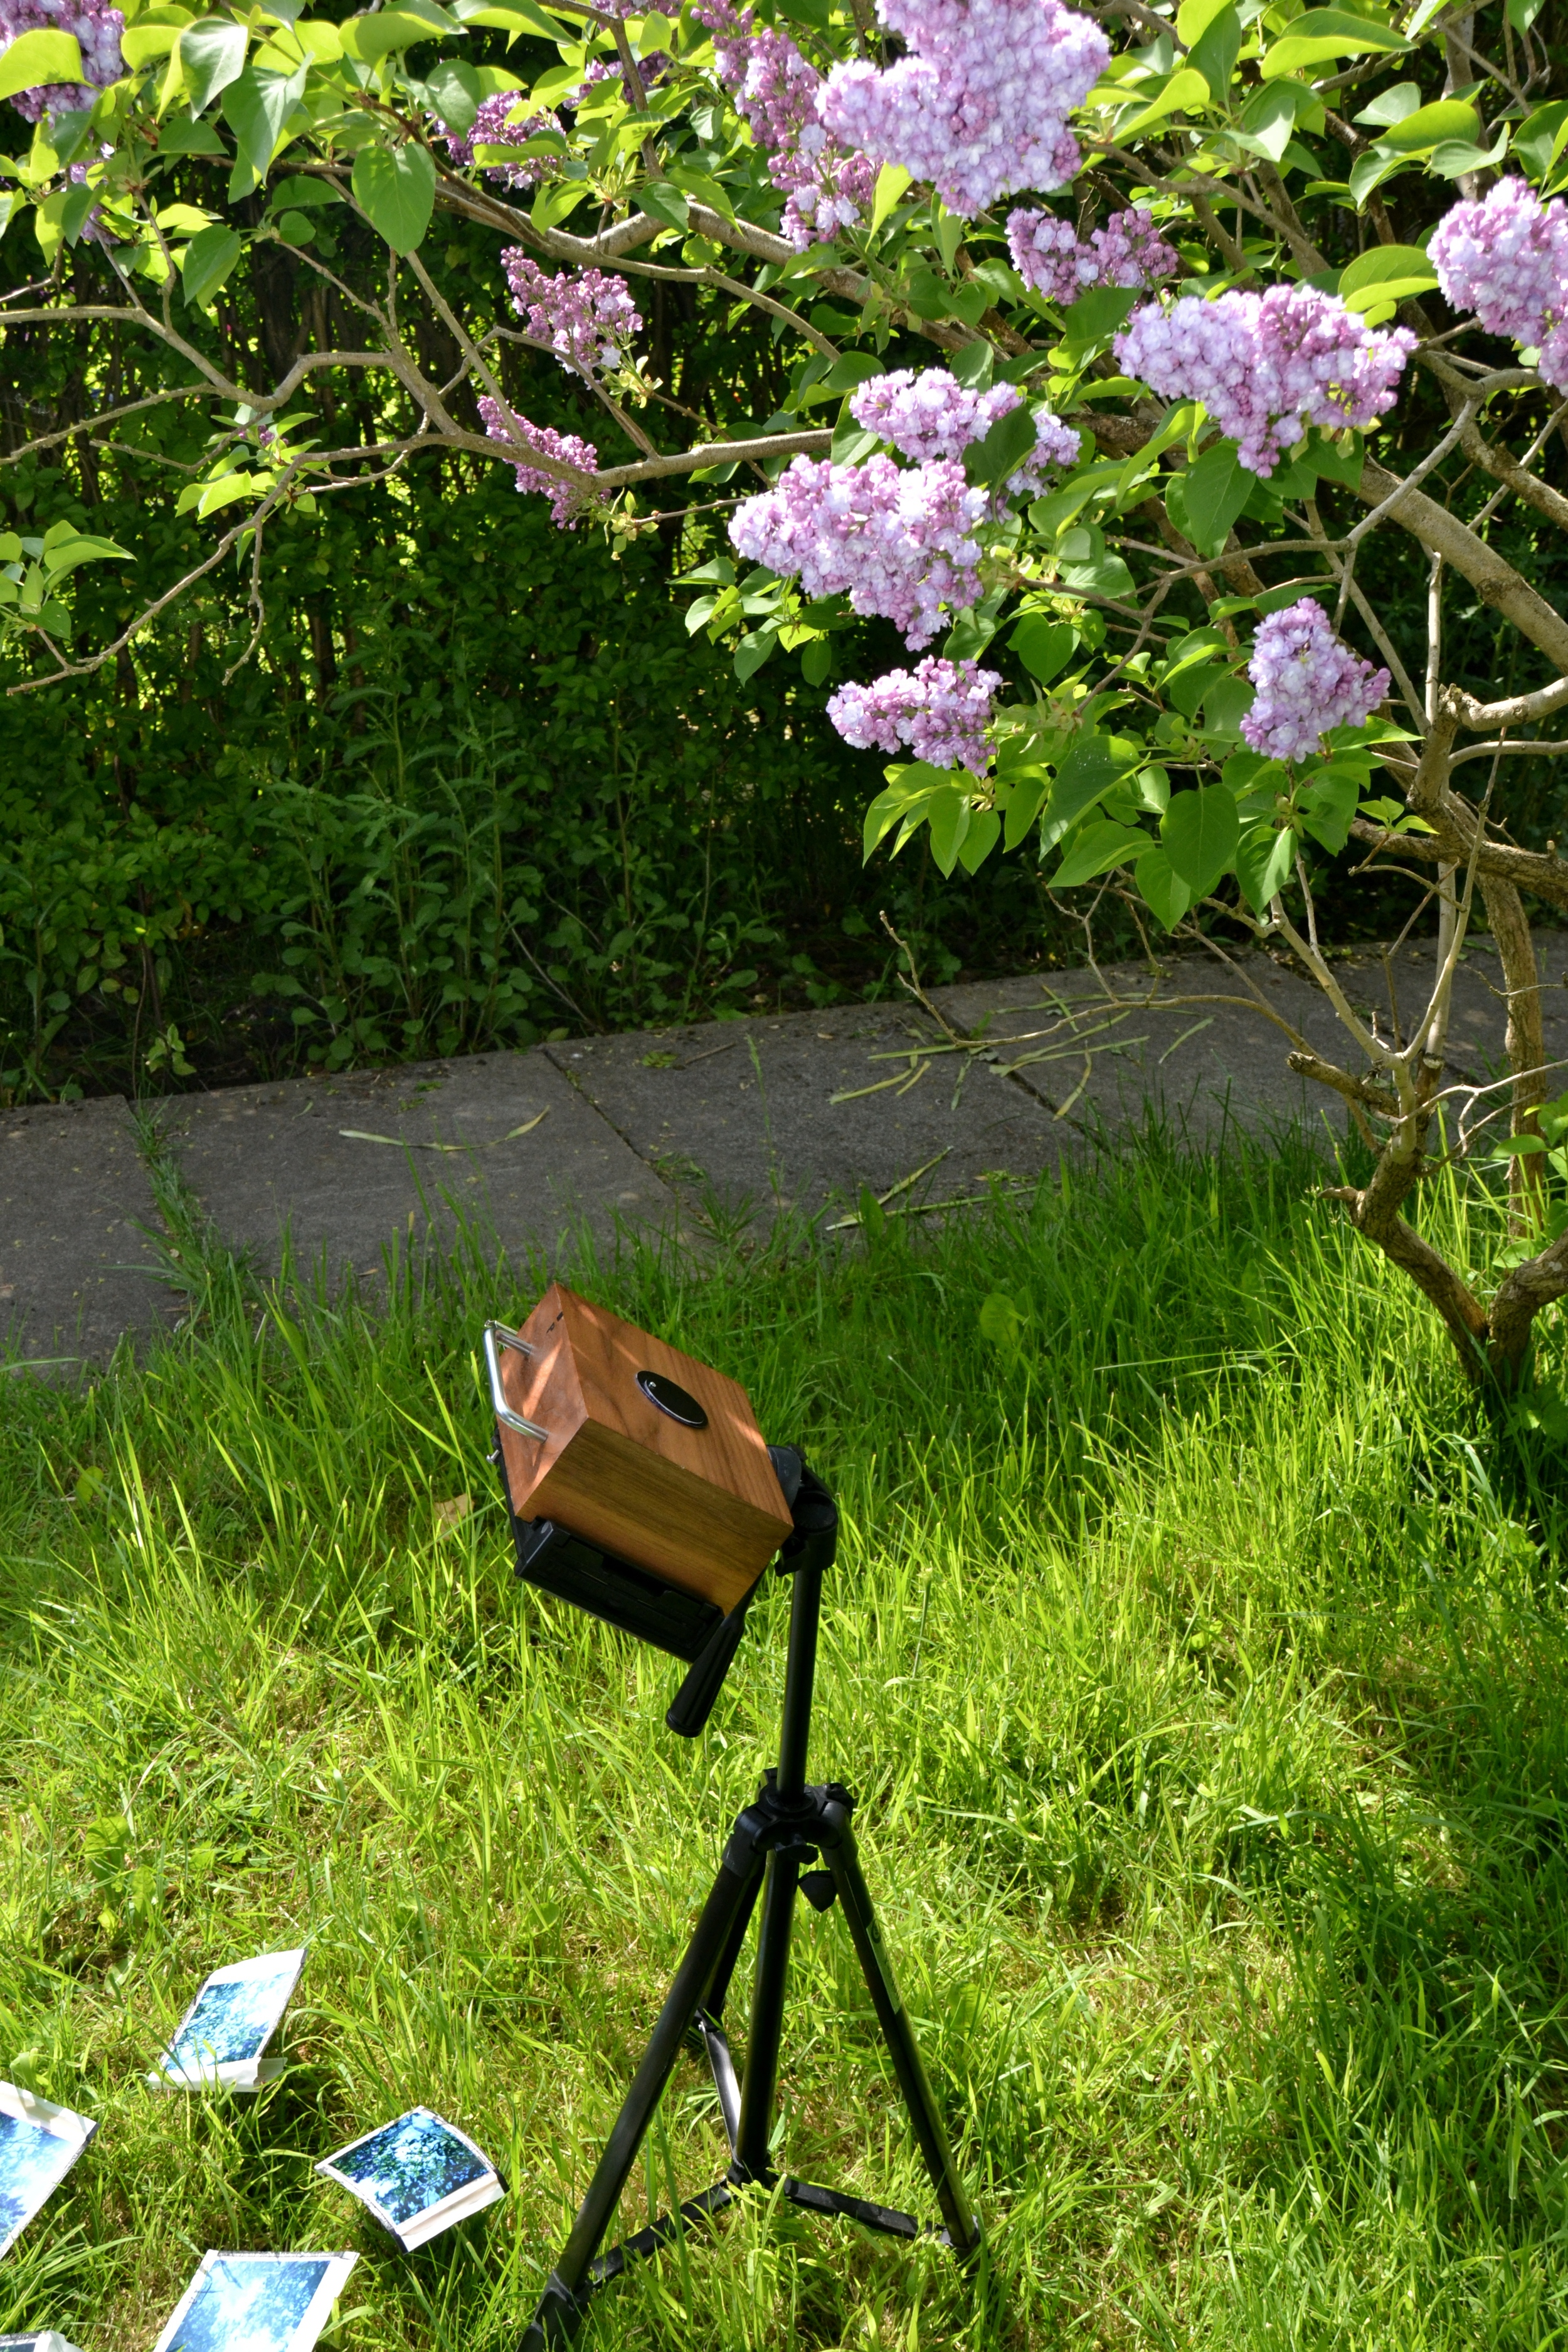 Lucy Wainwright - 5x4_pinhole_camera_polaroidback_LucyWainwright_2.JPG